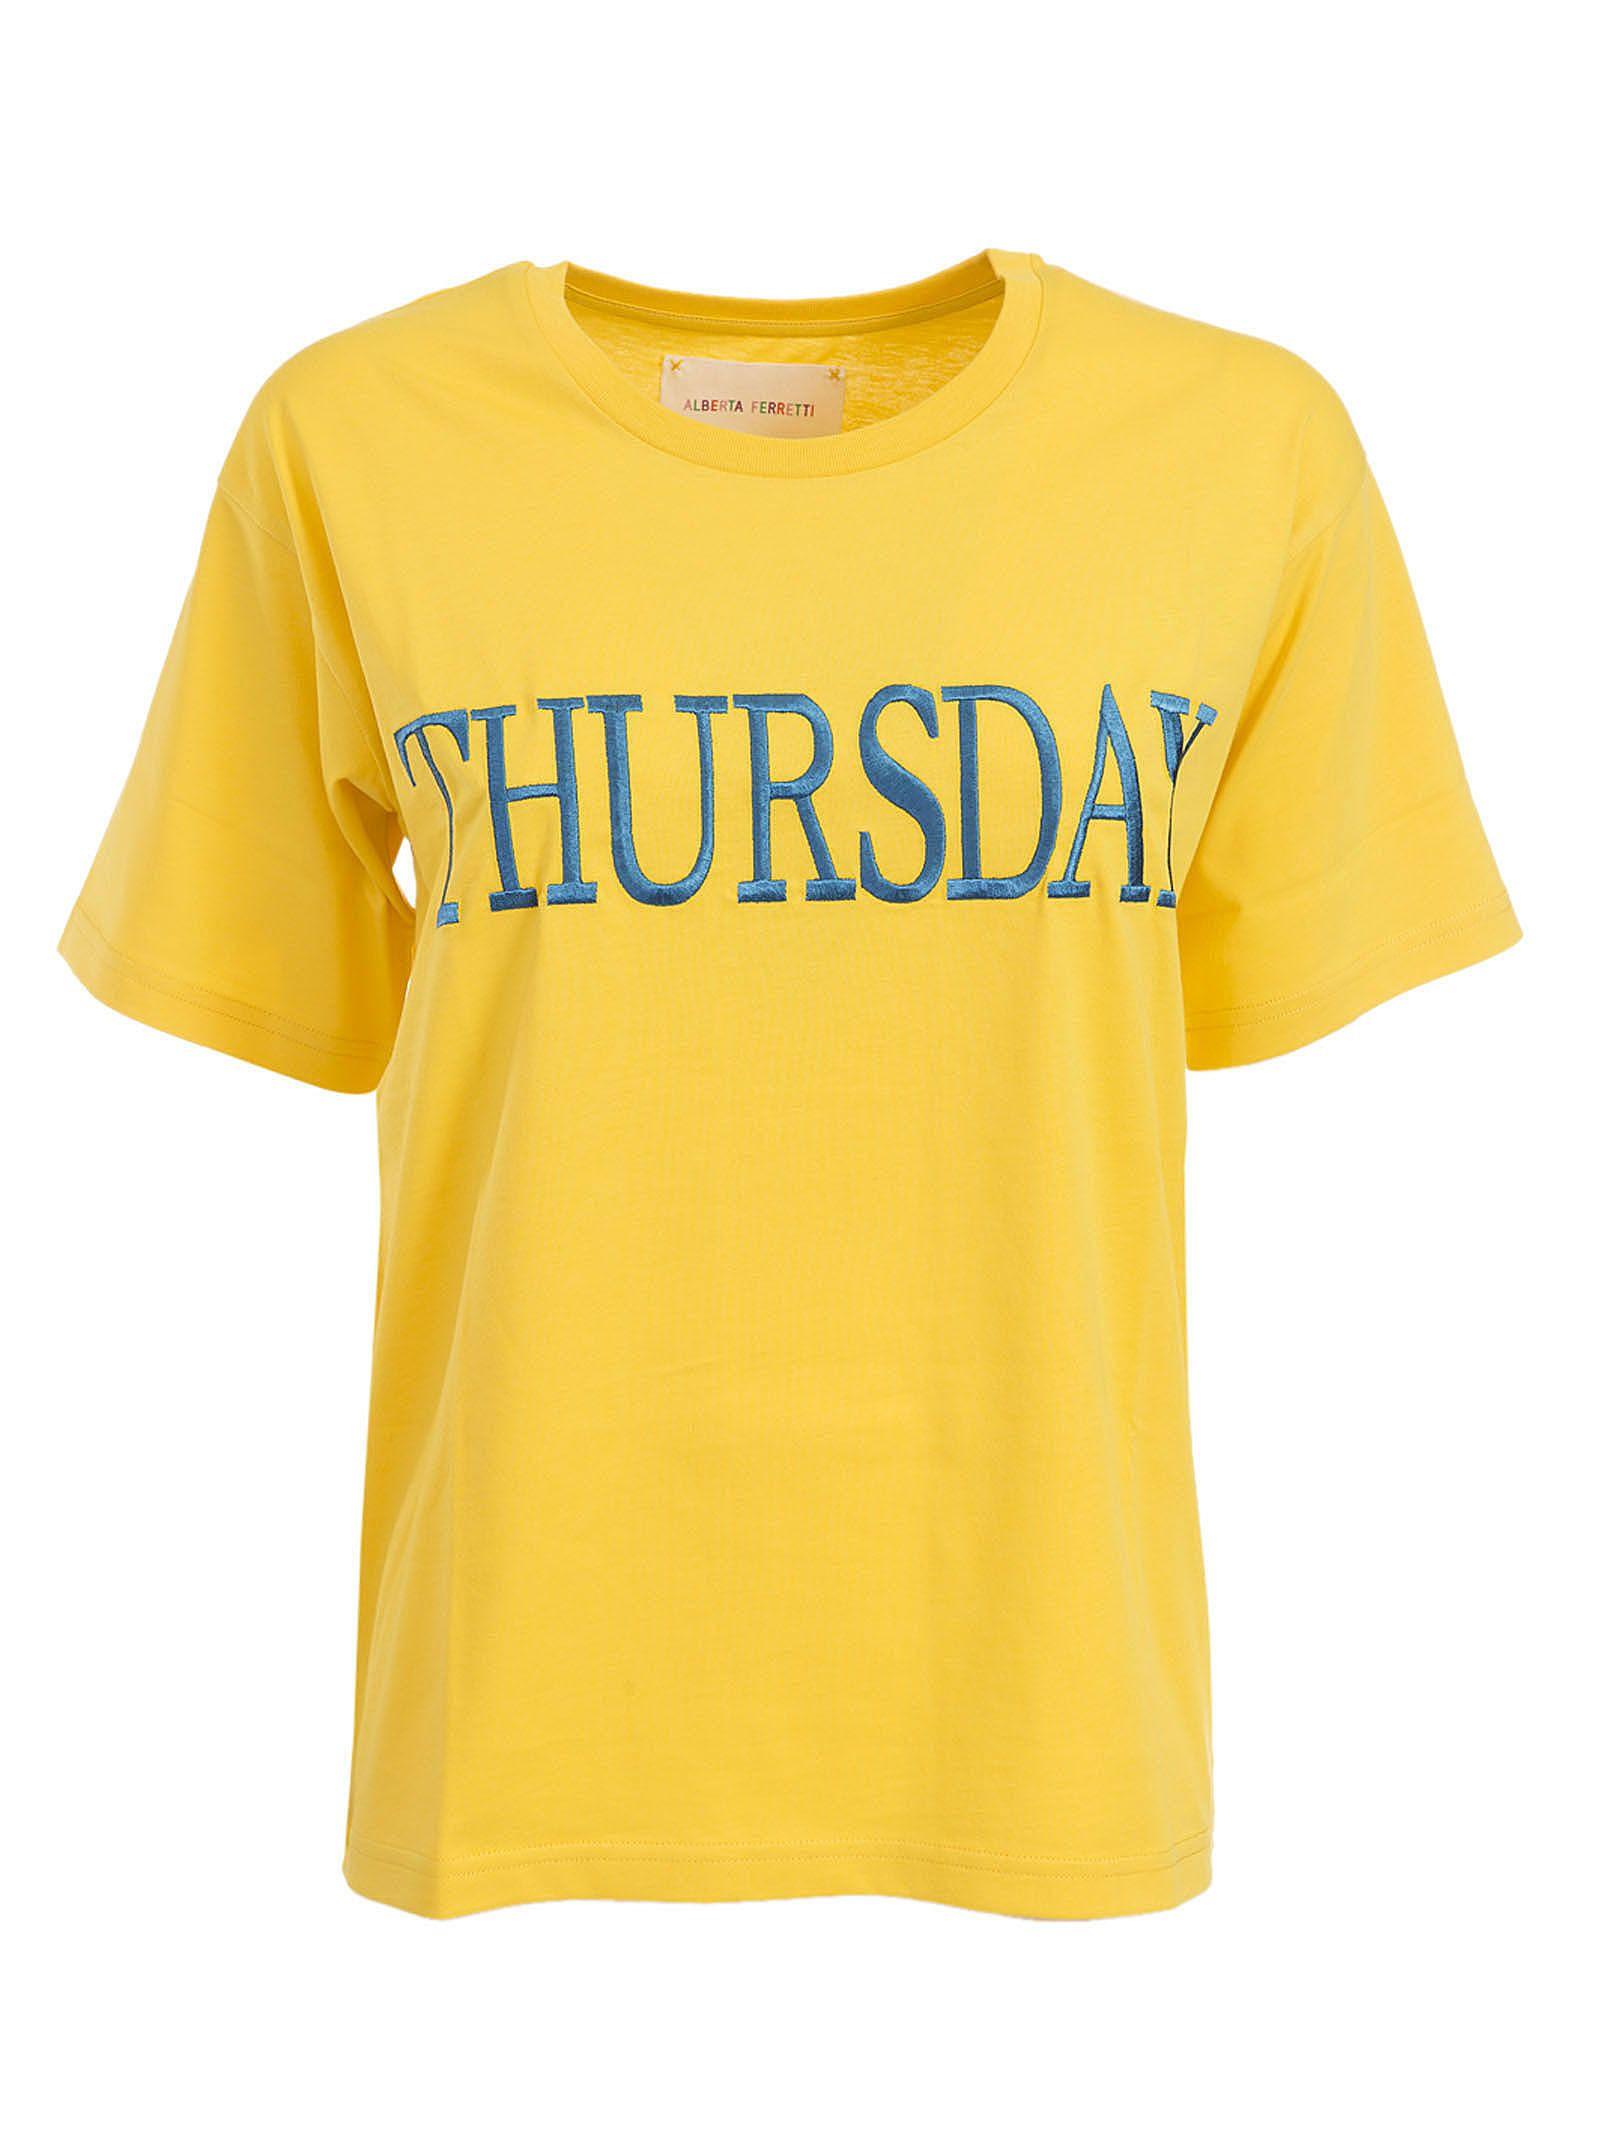 Alberta Ferretti Thursday Embroidered T-shirt